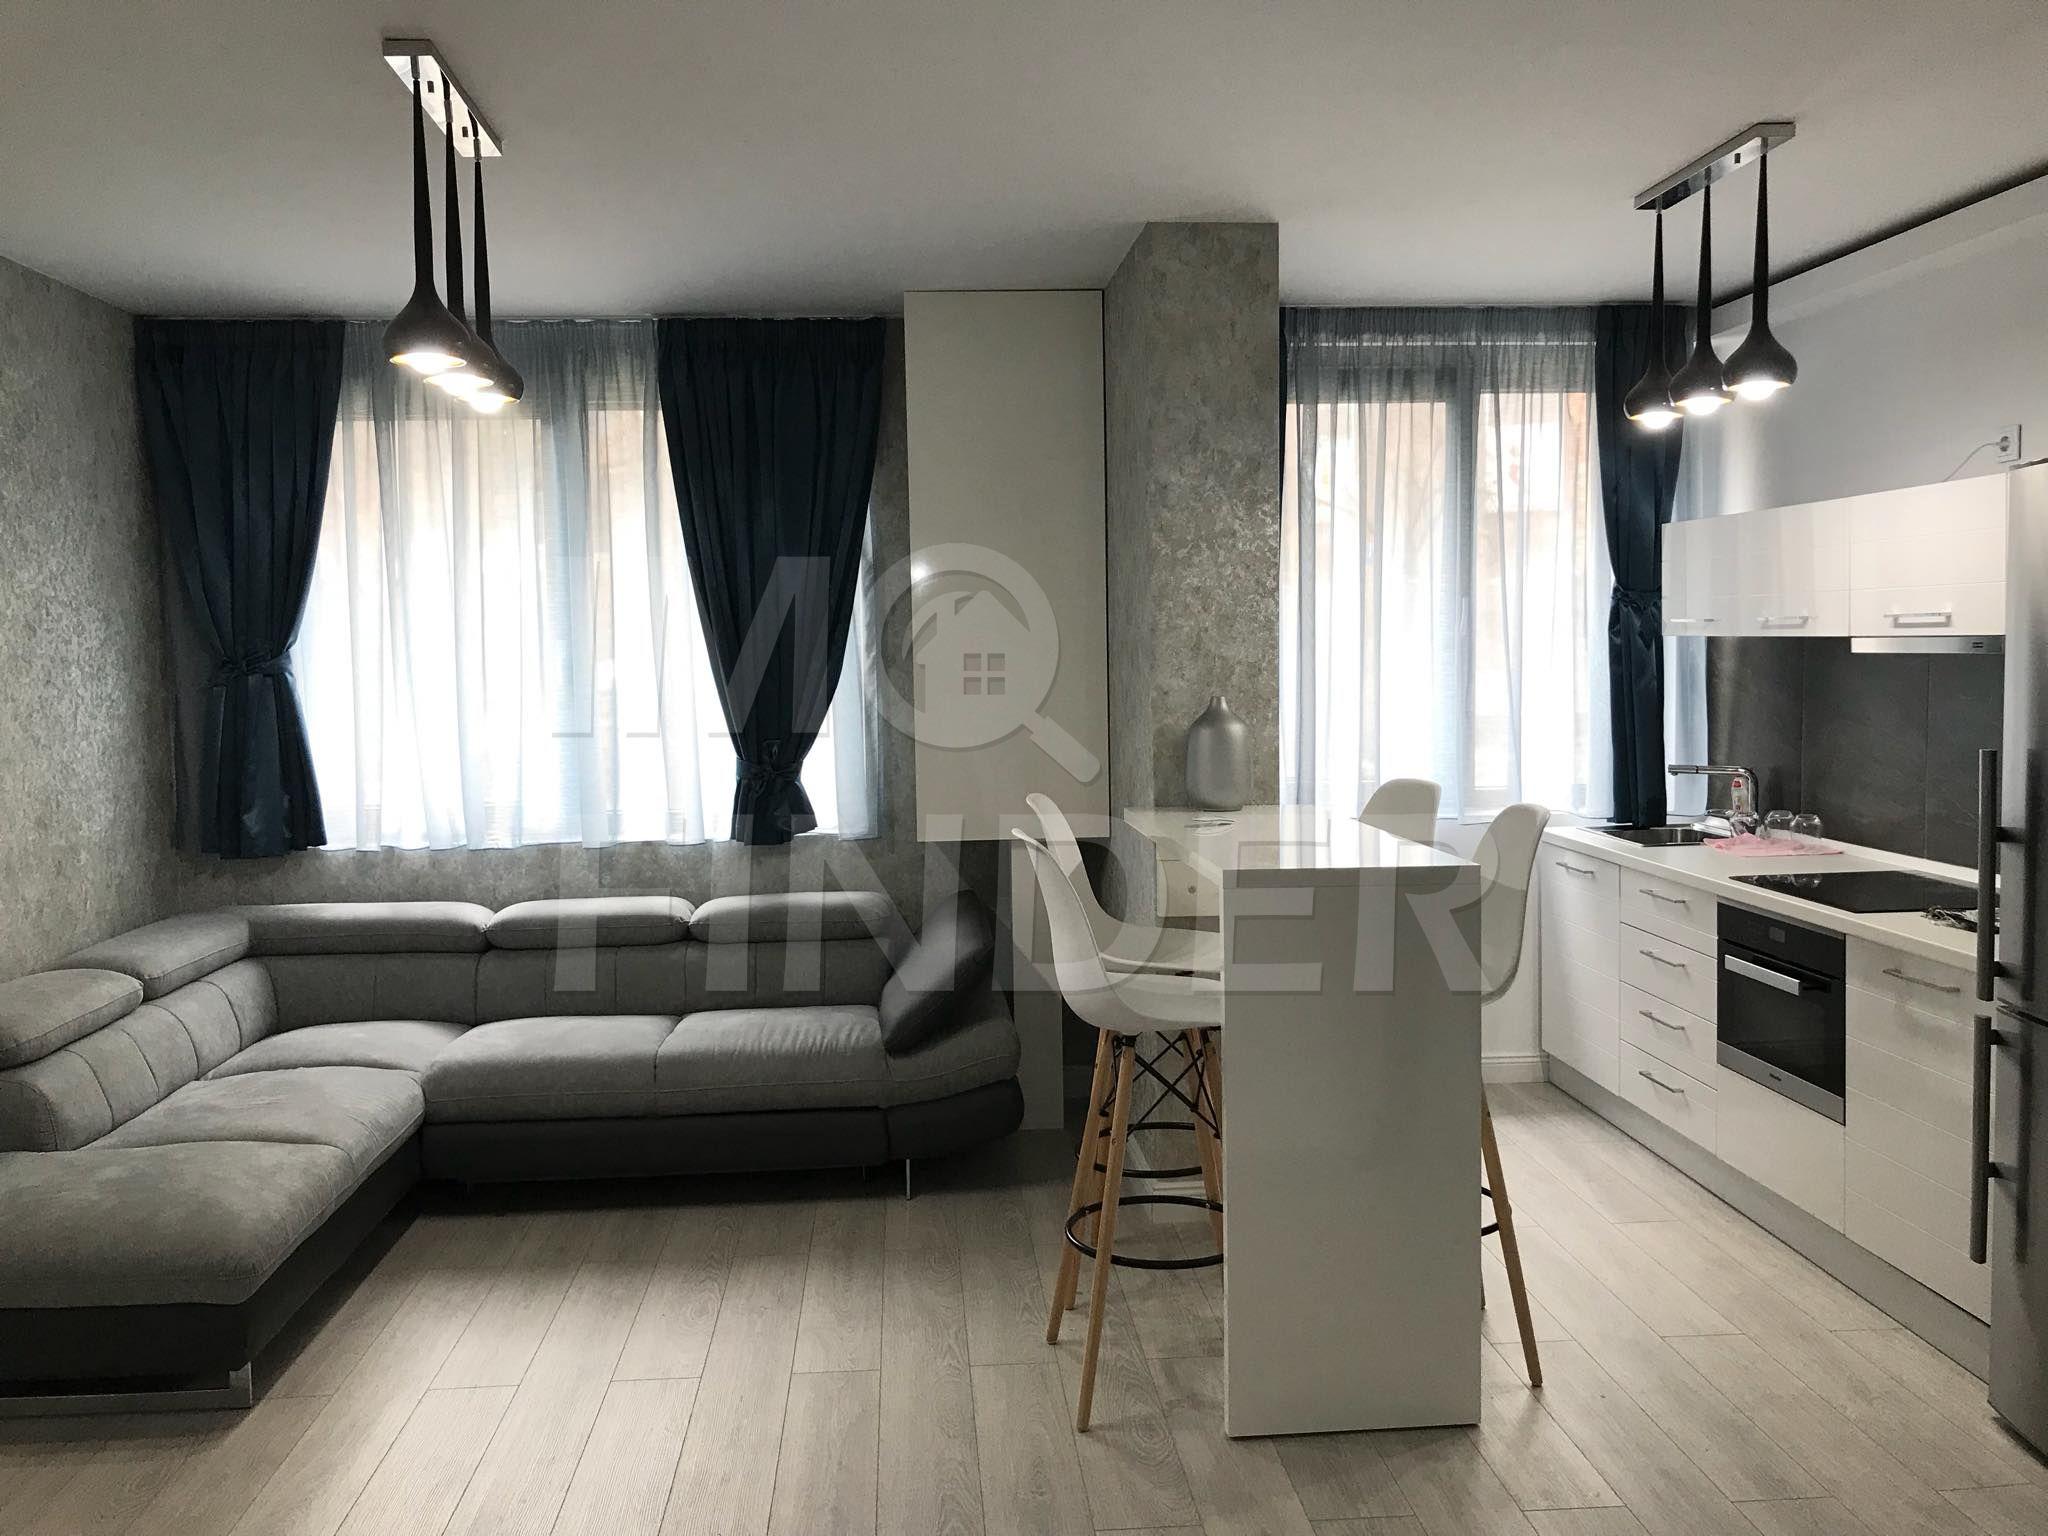 Vanzare apartament 3 camere, zona Clinicilor, imobil nou